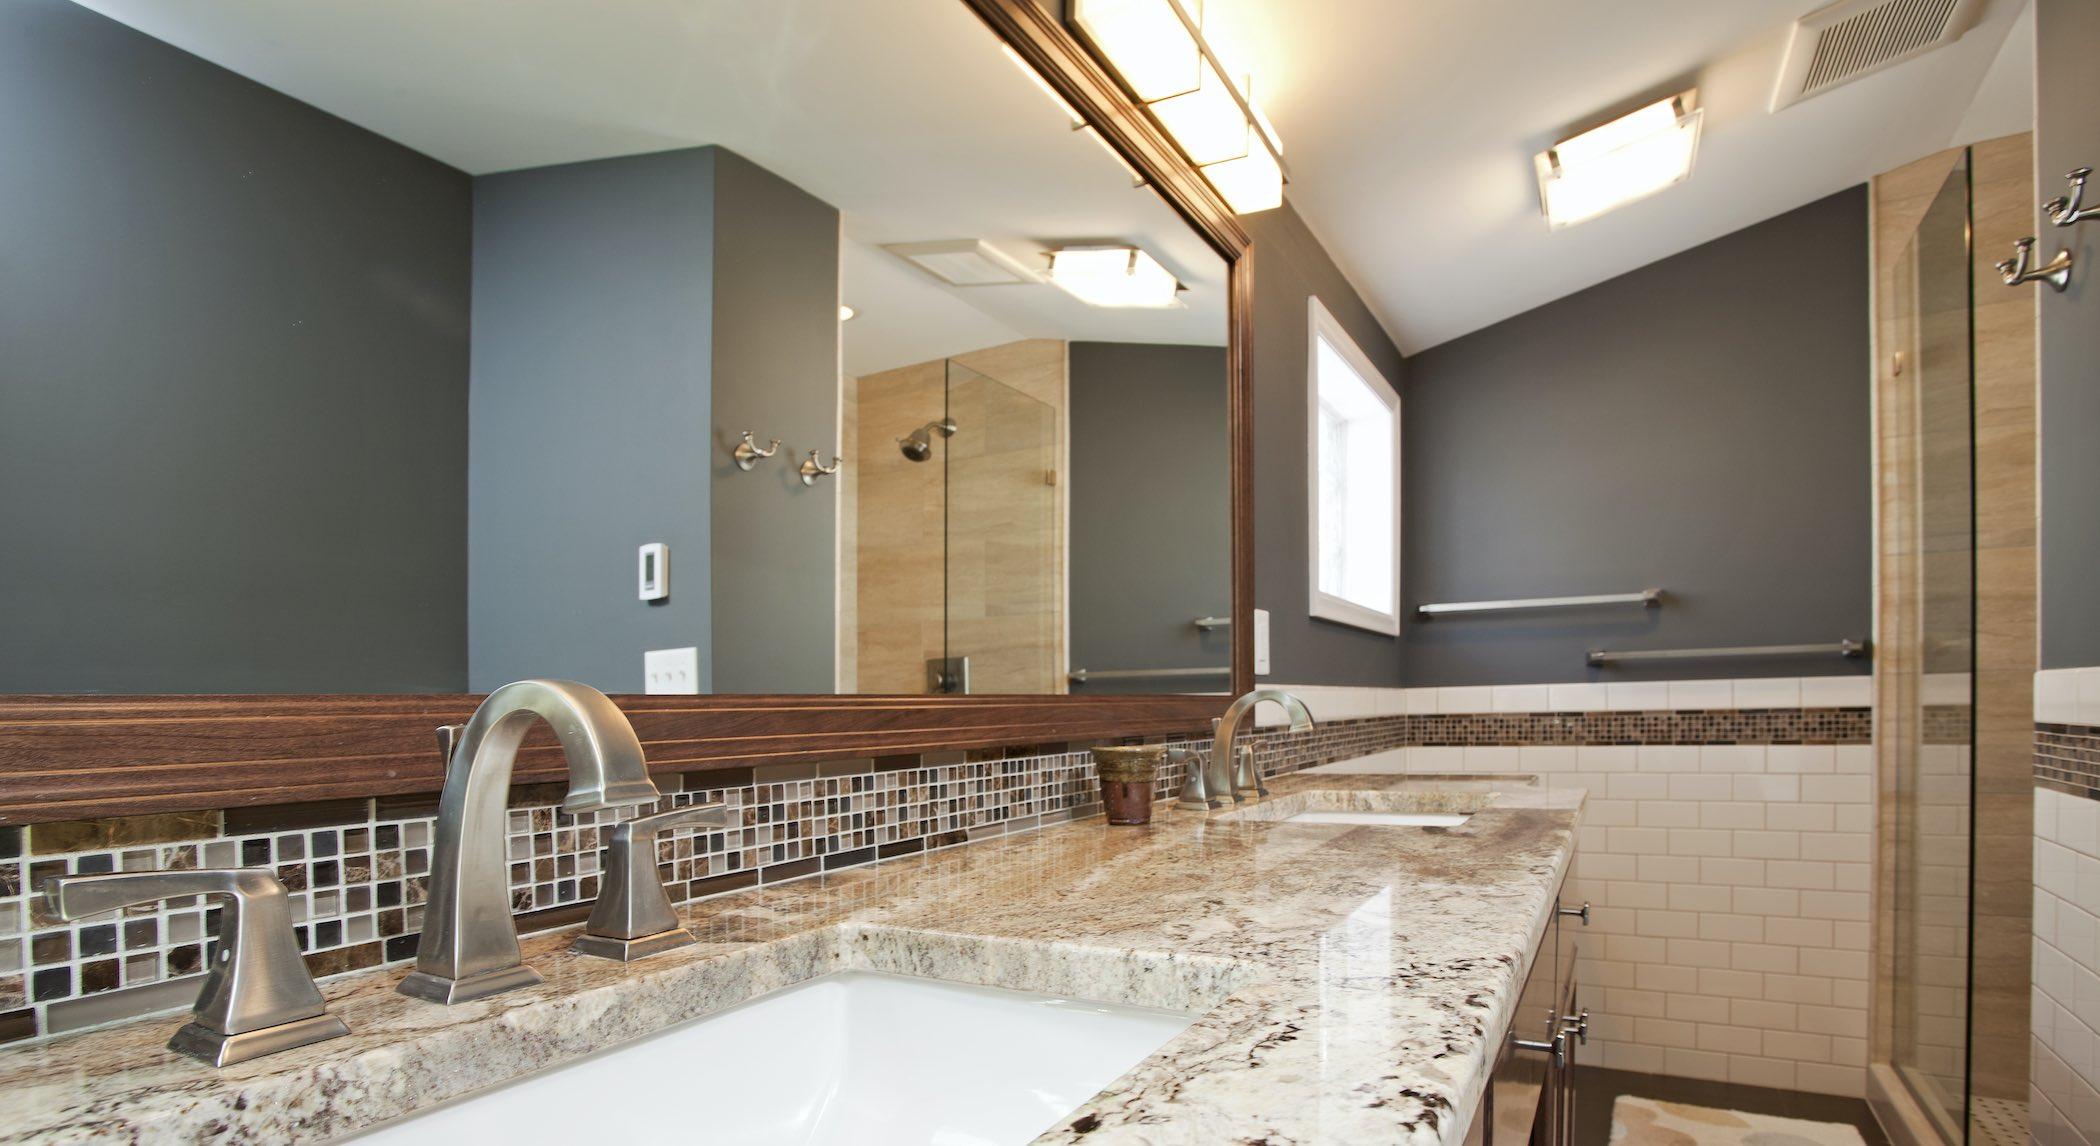 Bathroom Remodel Minneapolis, MN